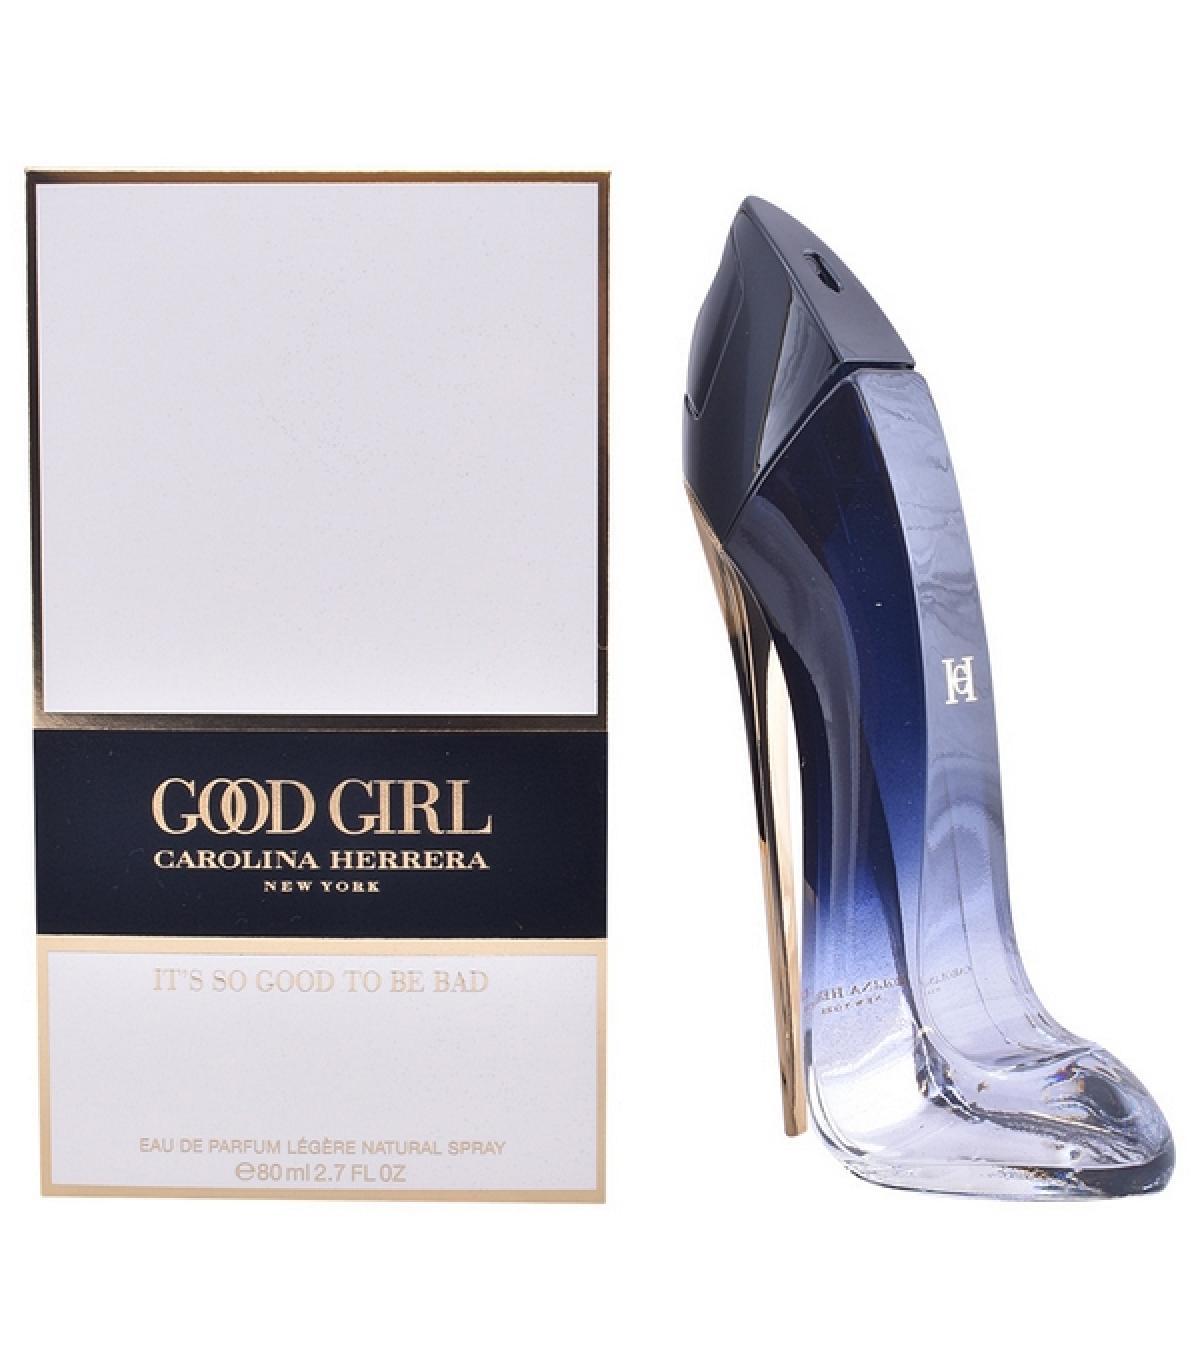 Perfume Good Legère Girl Mujer Carolina Herrera Edp N0nm8w